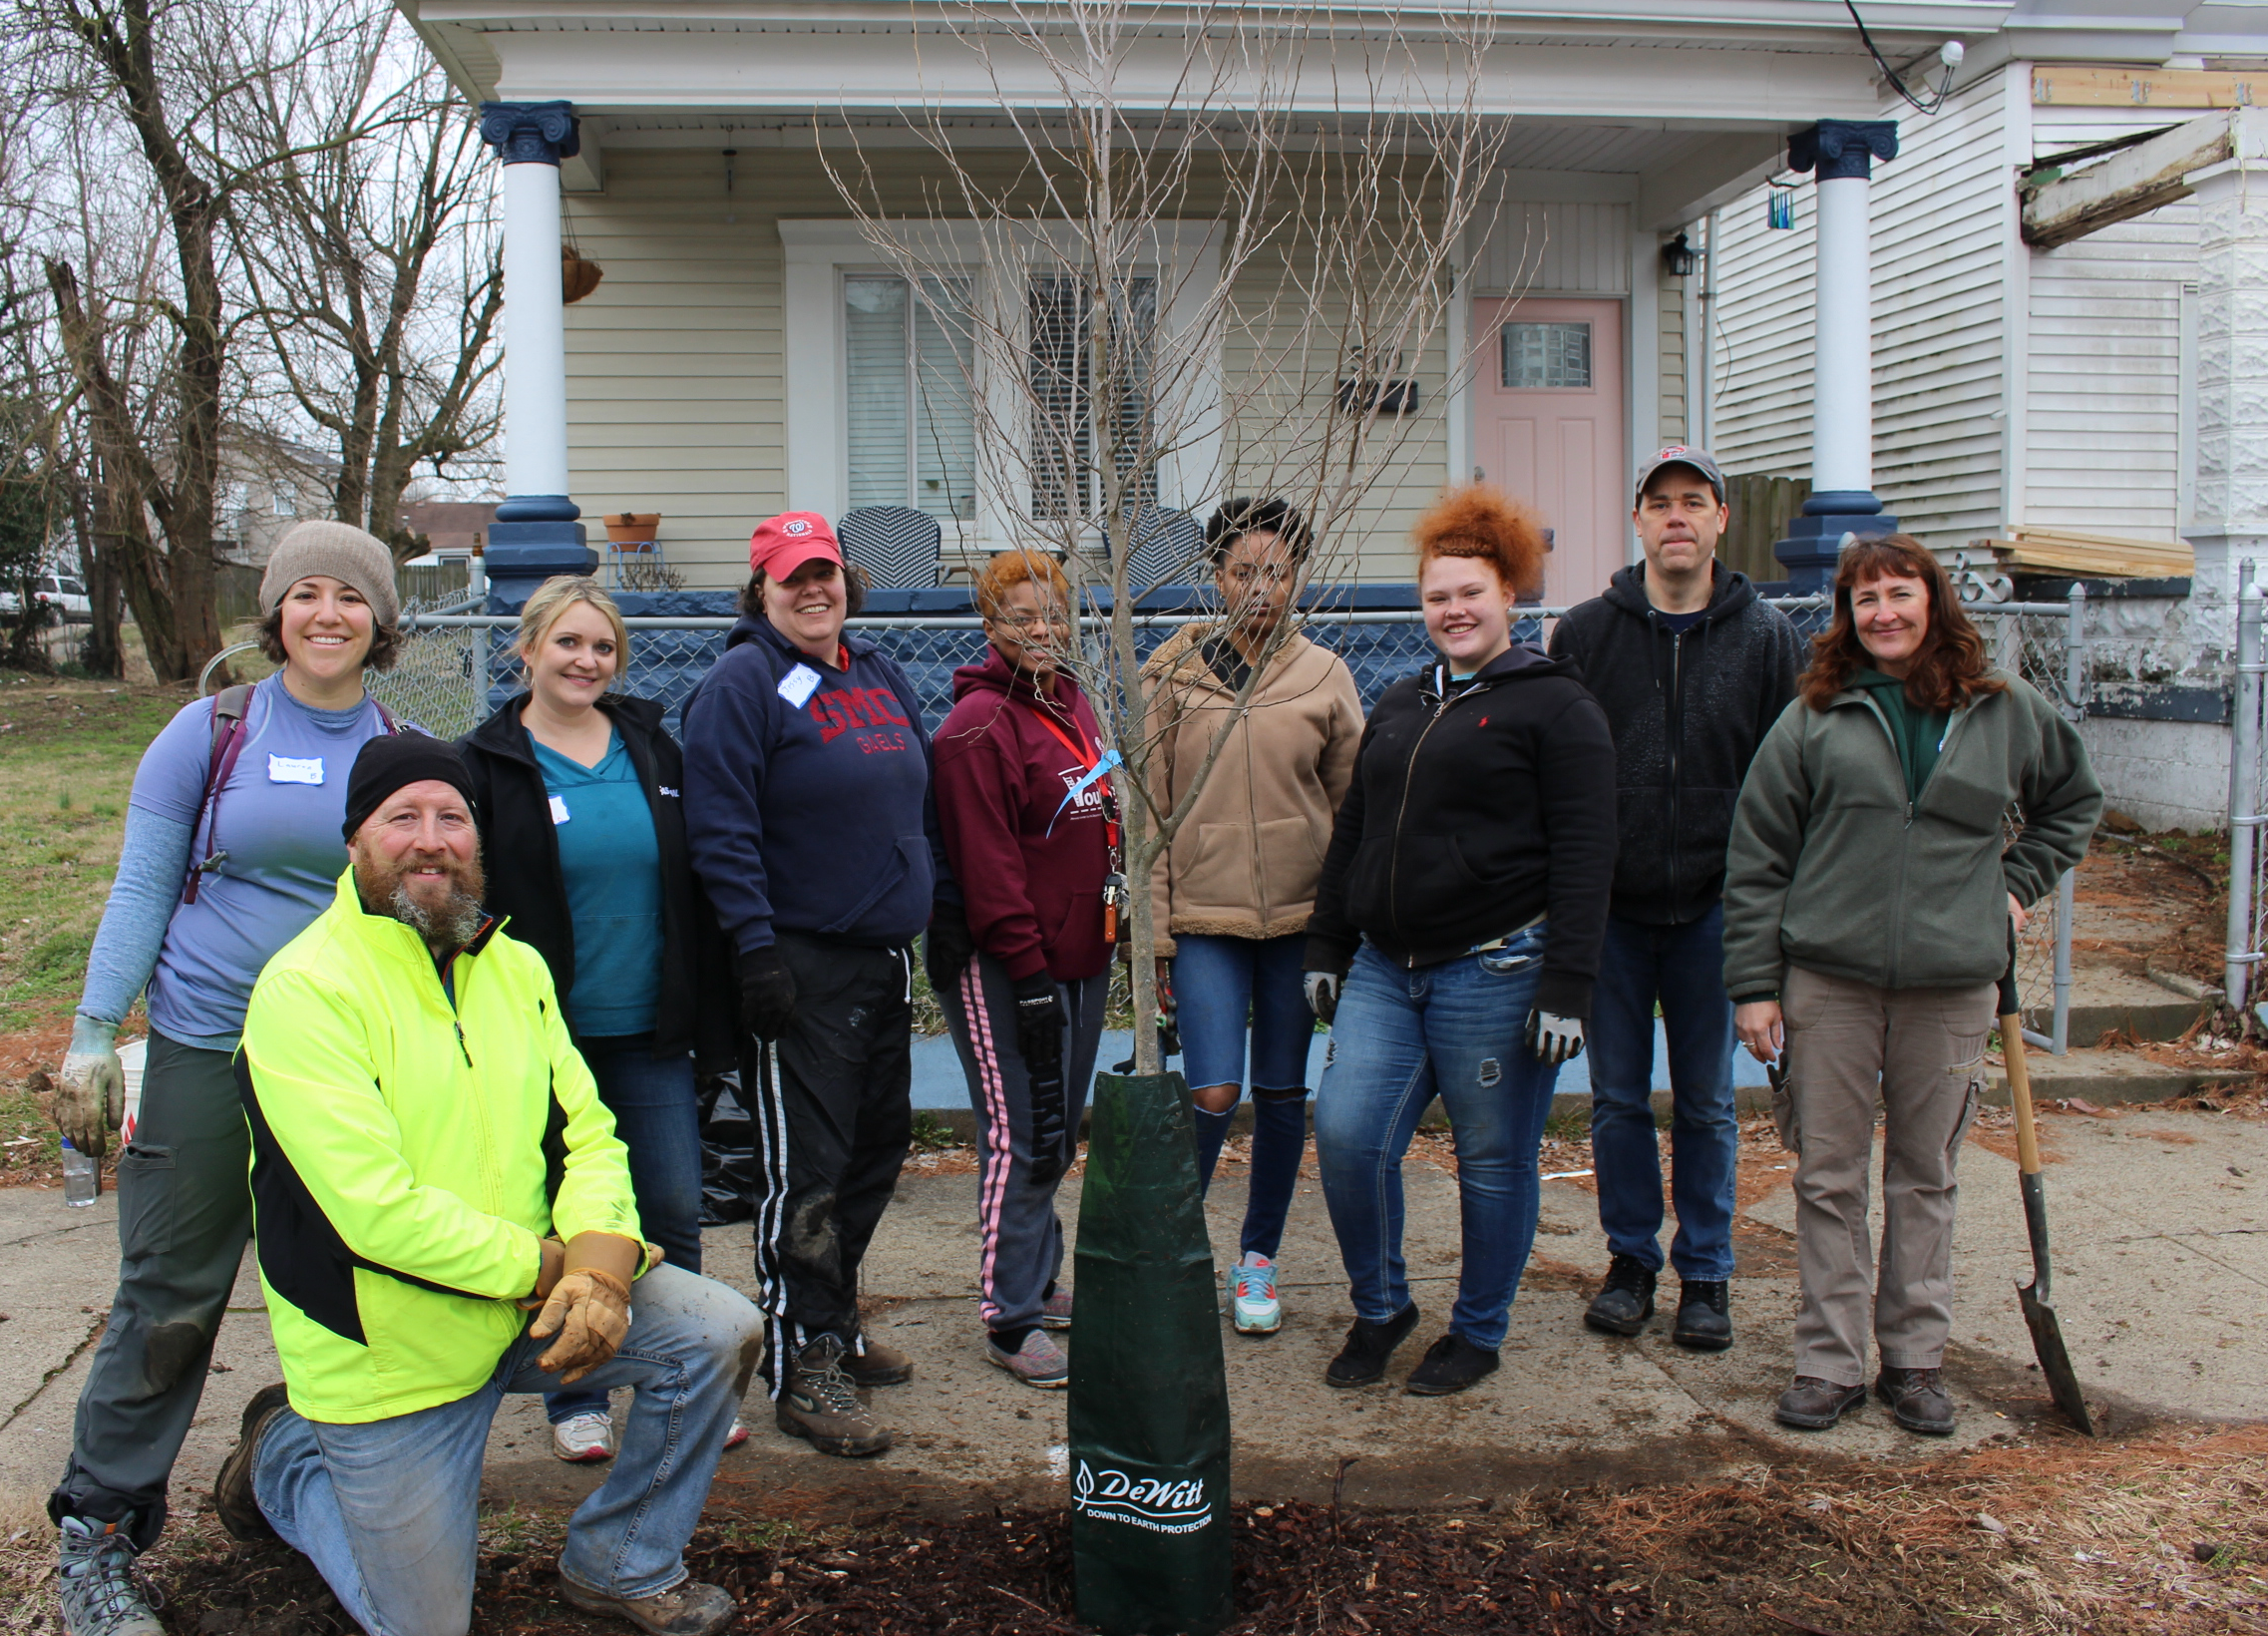 Caption: Volunteers planting trees in Louisville